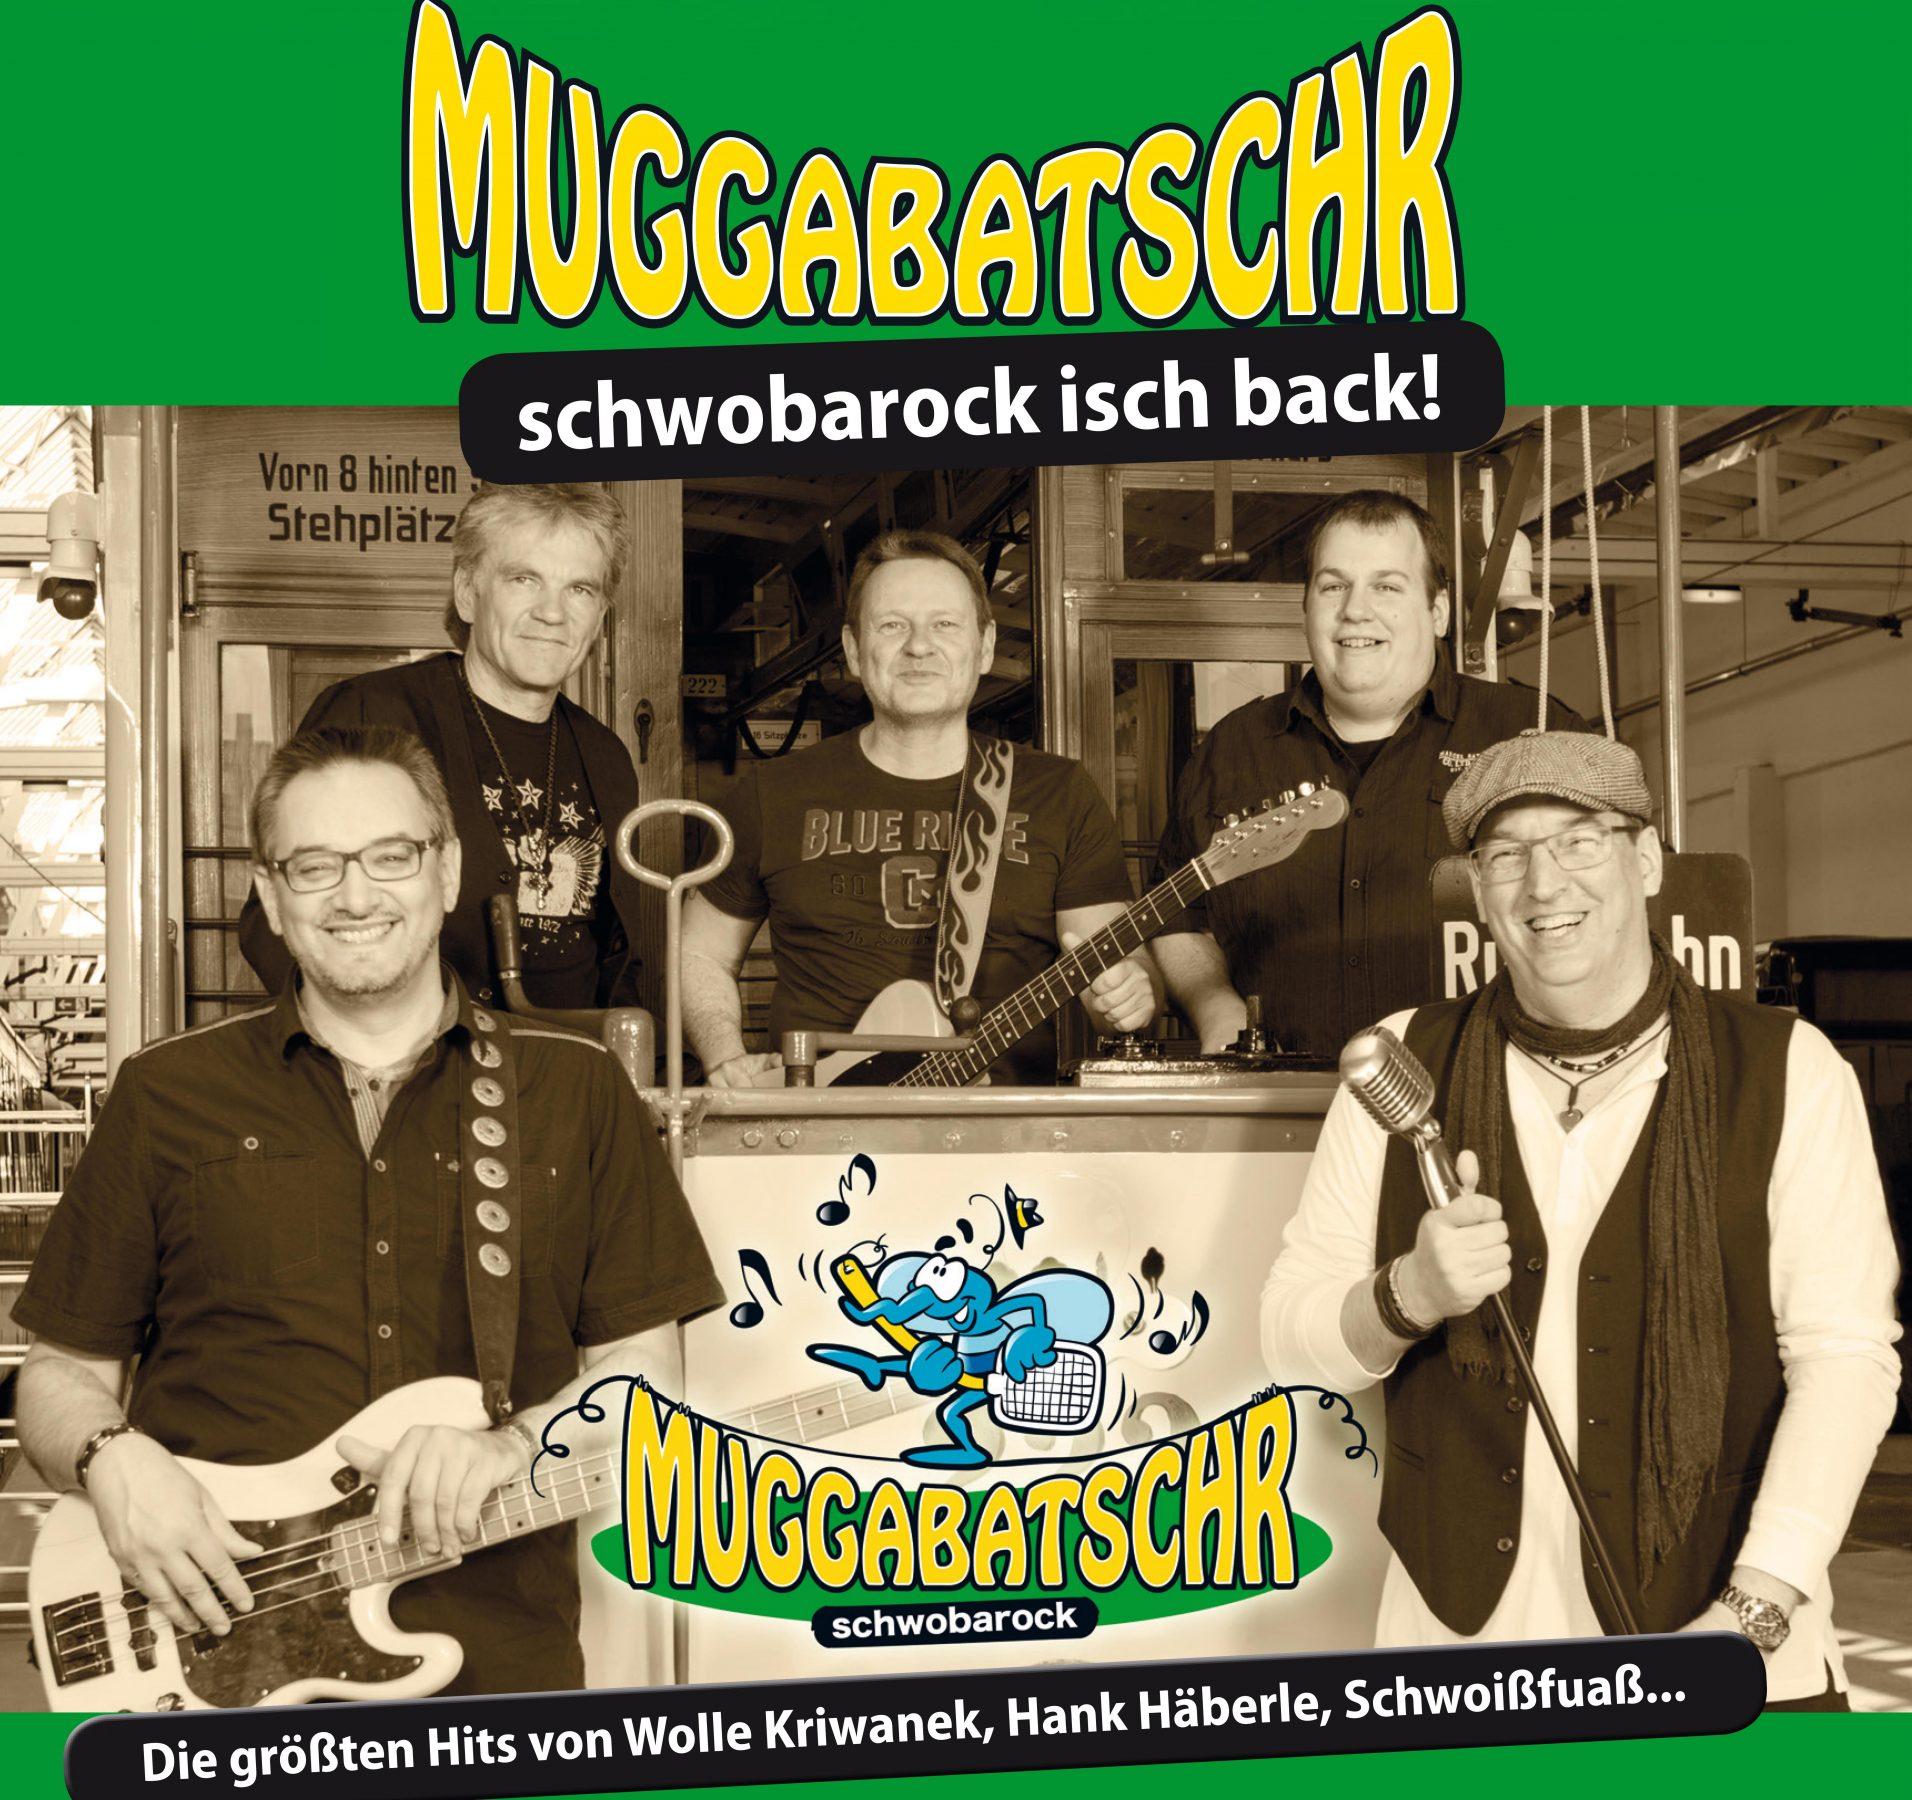 Muggabatschr Plakatmotiv Sommerfest 2019